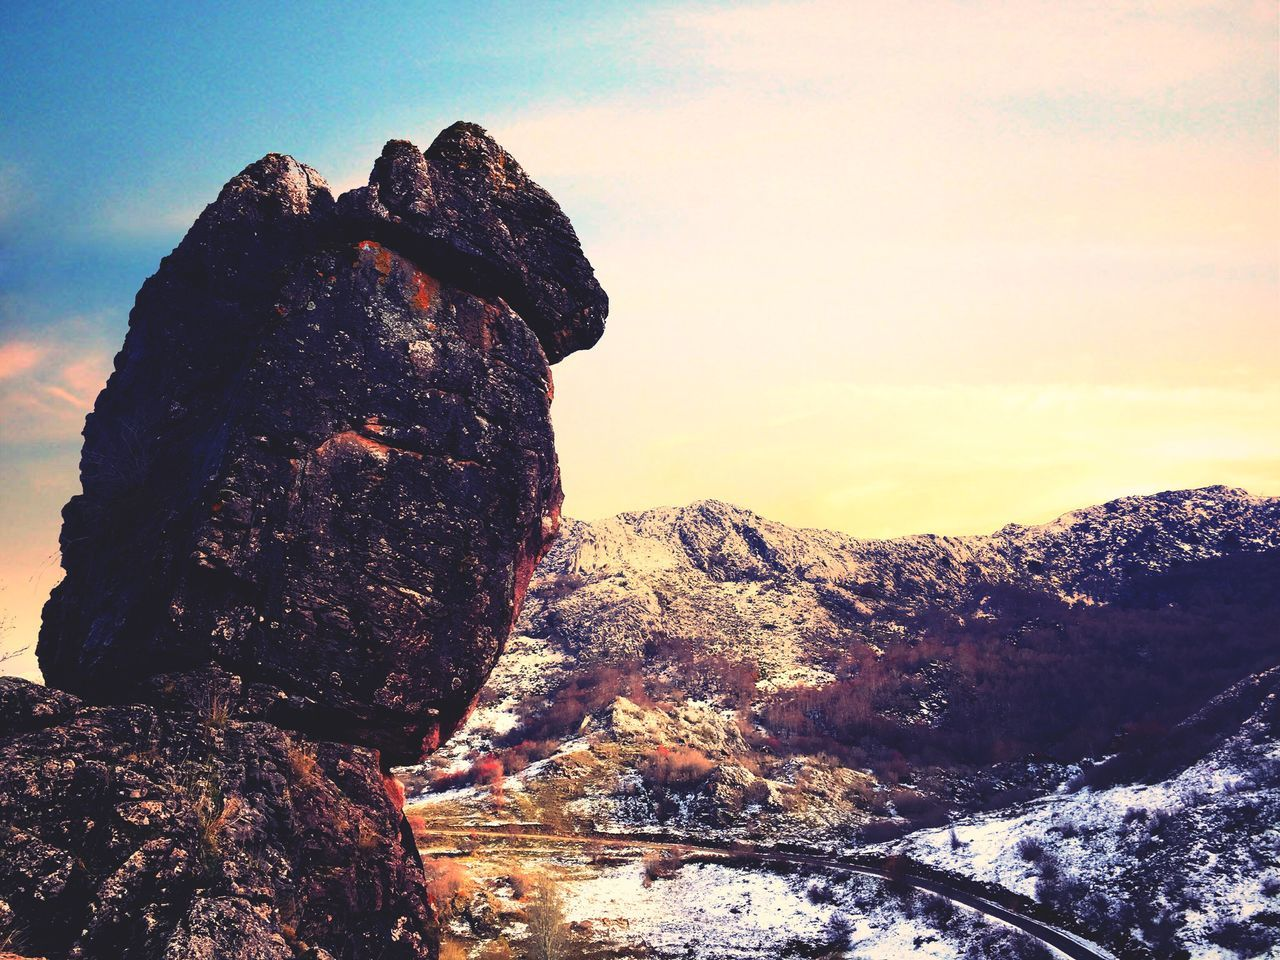 Miles Away Leon Cuevas De Valdeporque Fresh Air Mountains Nature Sky Uniqueness